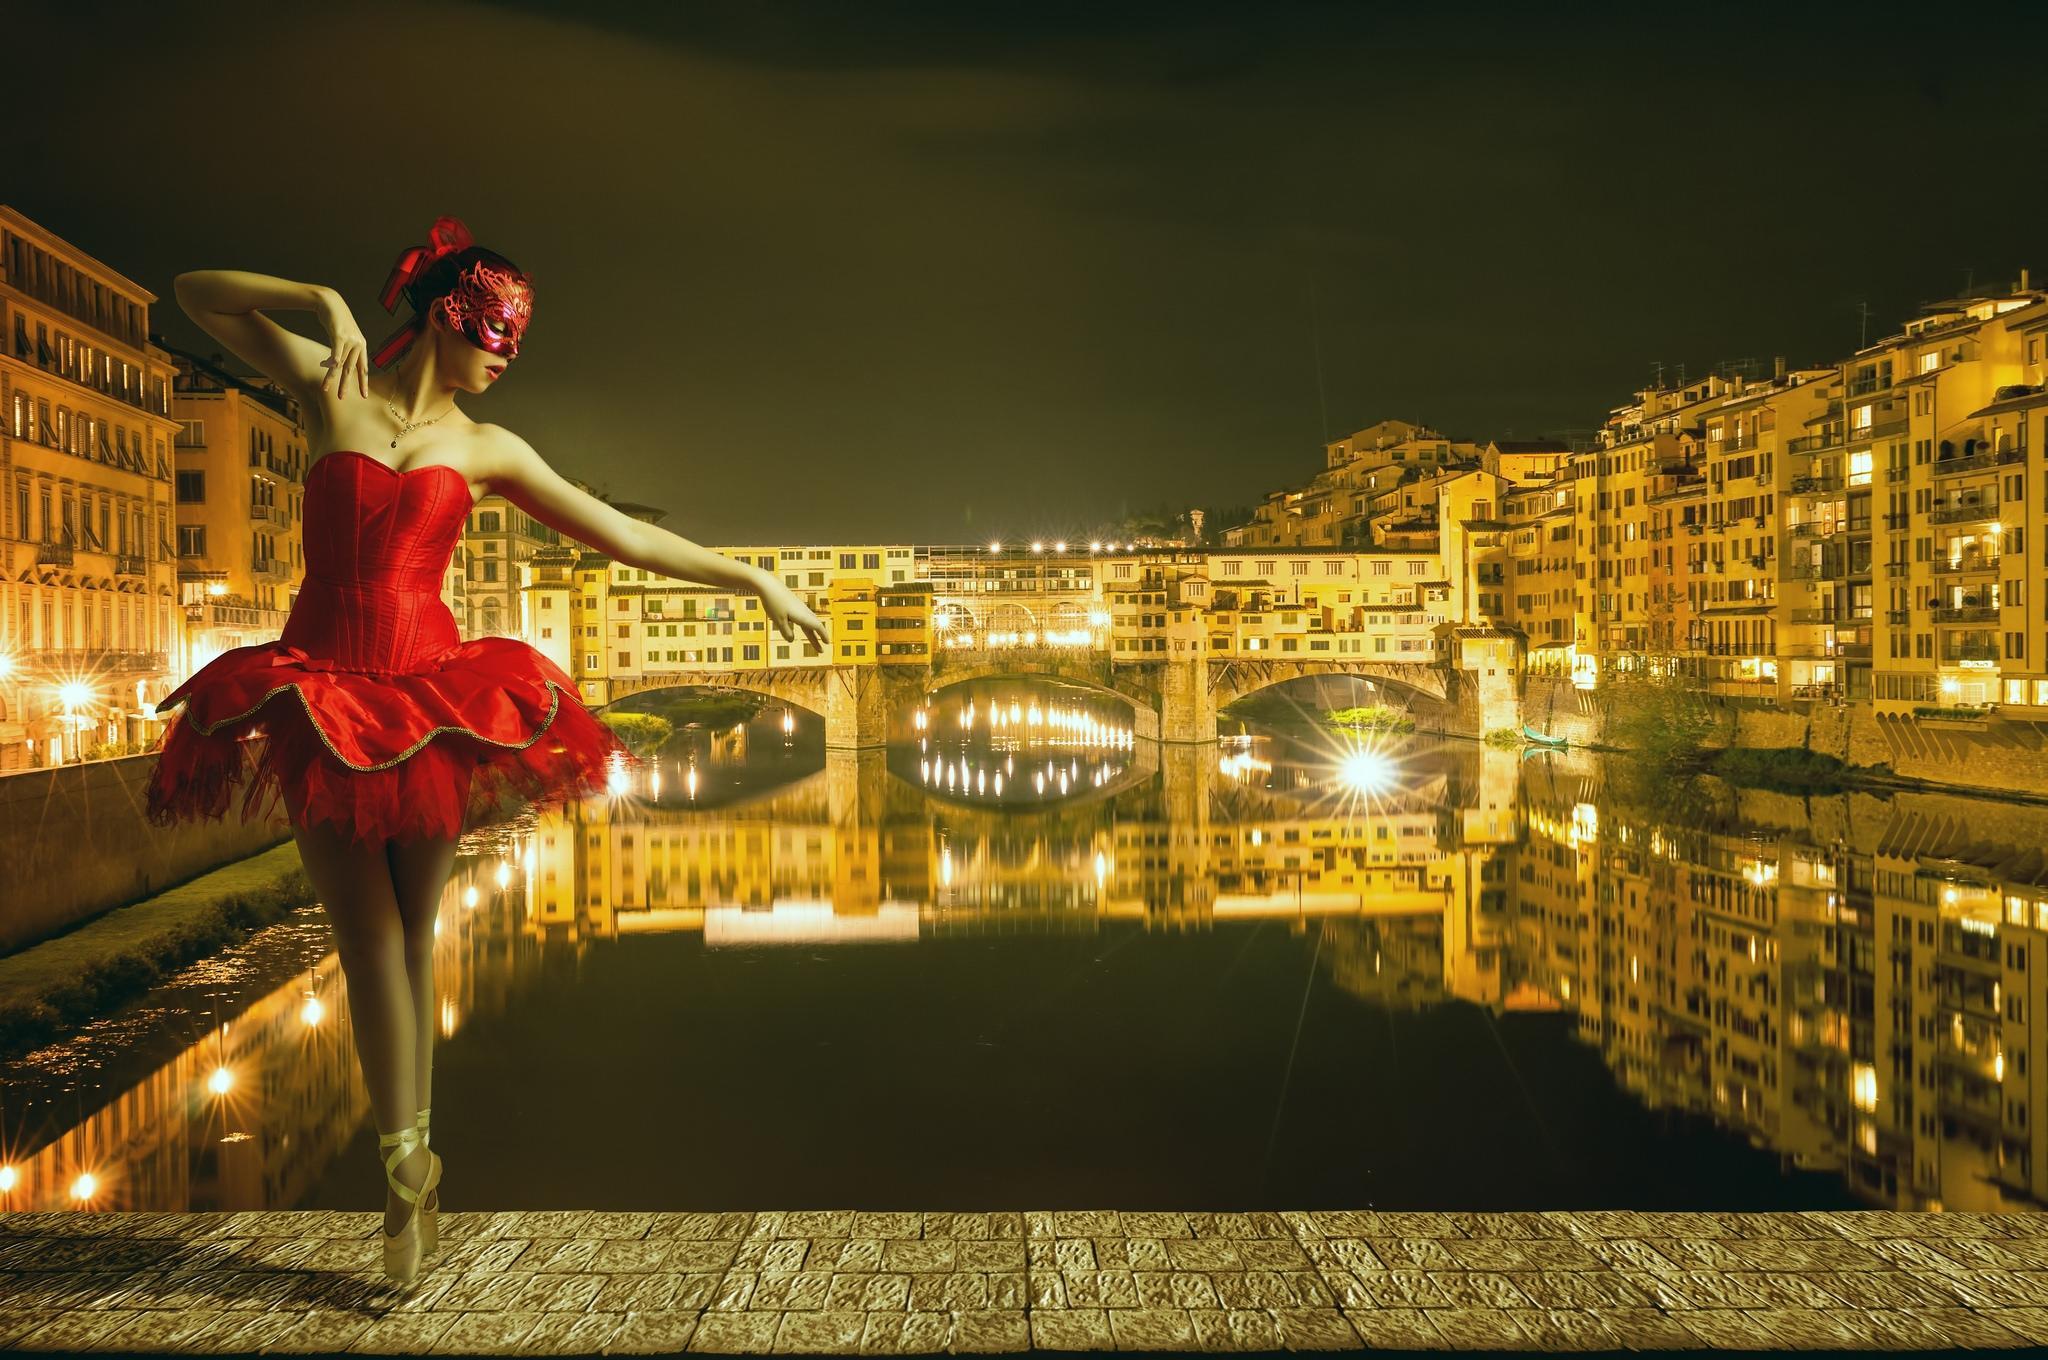 обои Мост Понте Веккьо, Флоренция, девушка, балерина картинки фото